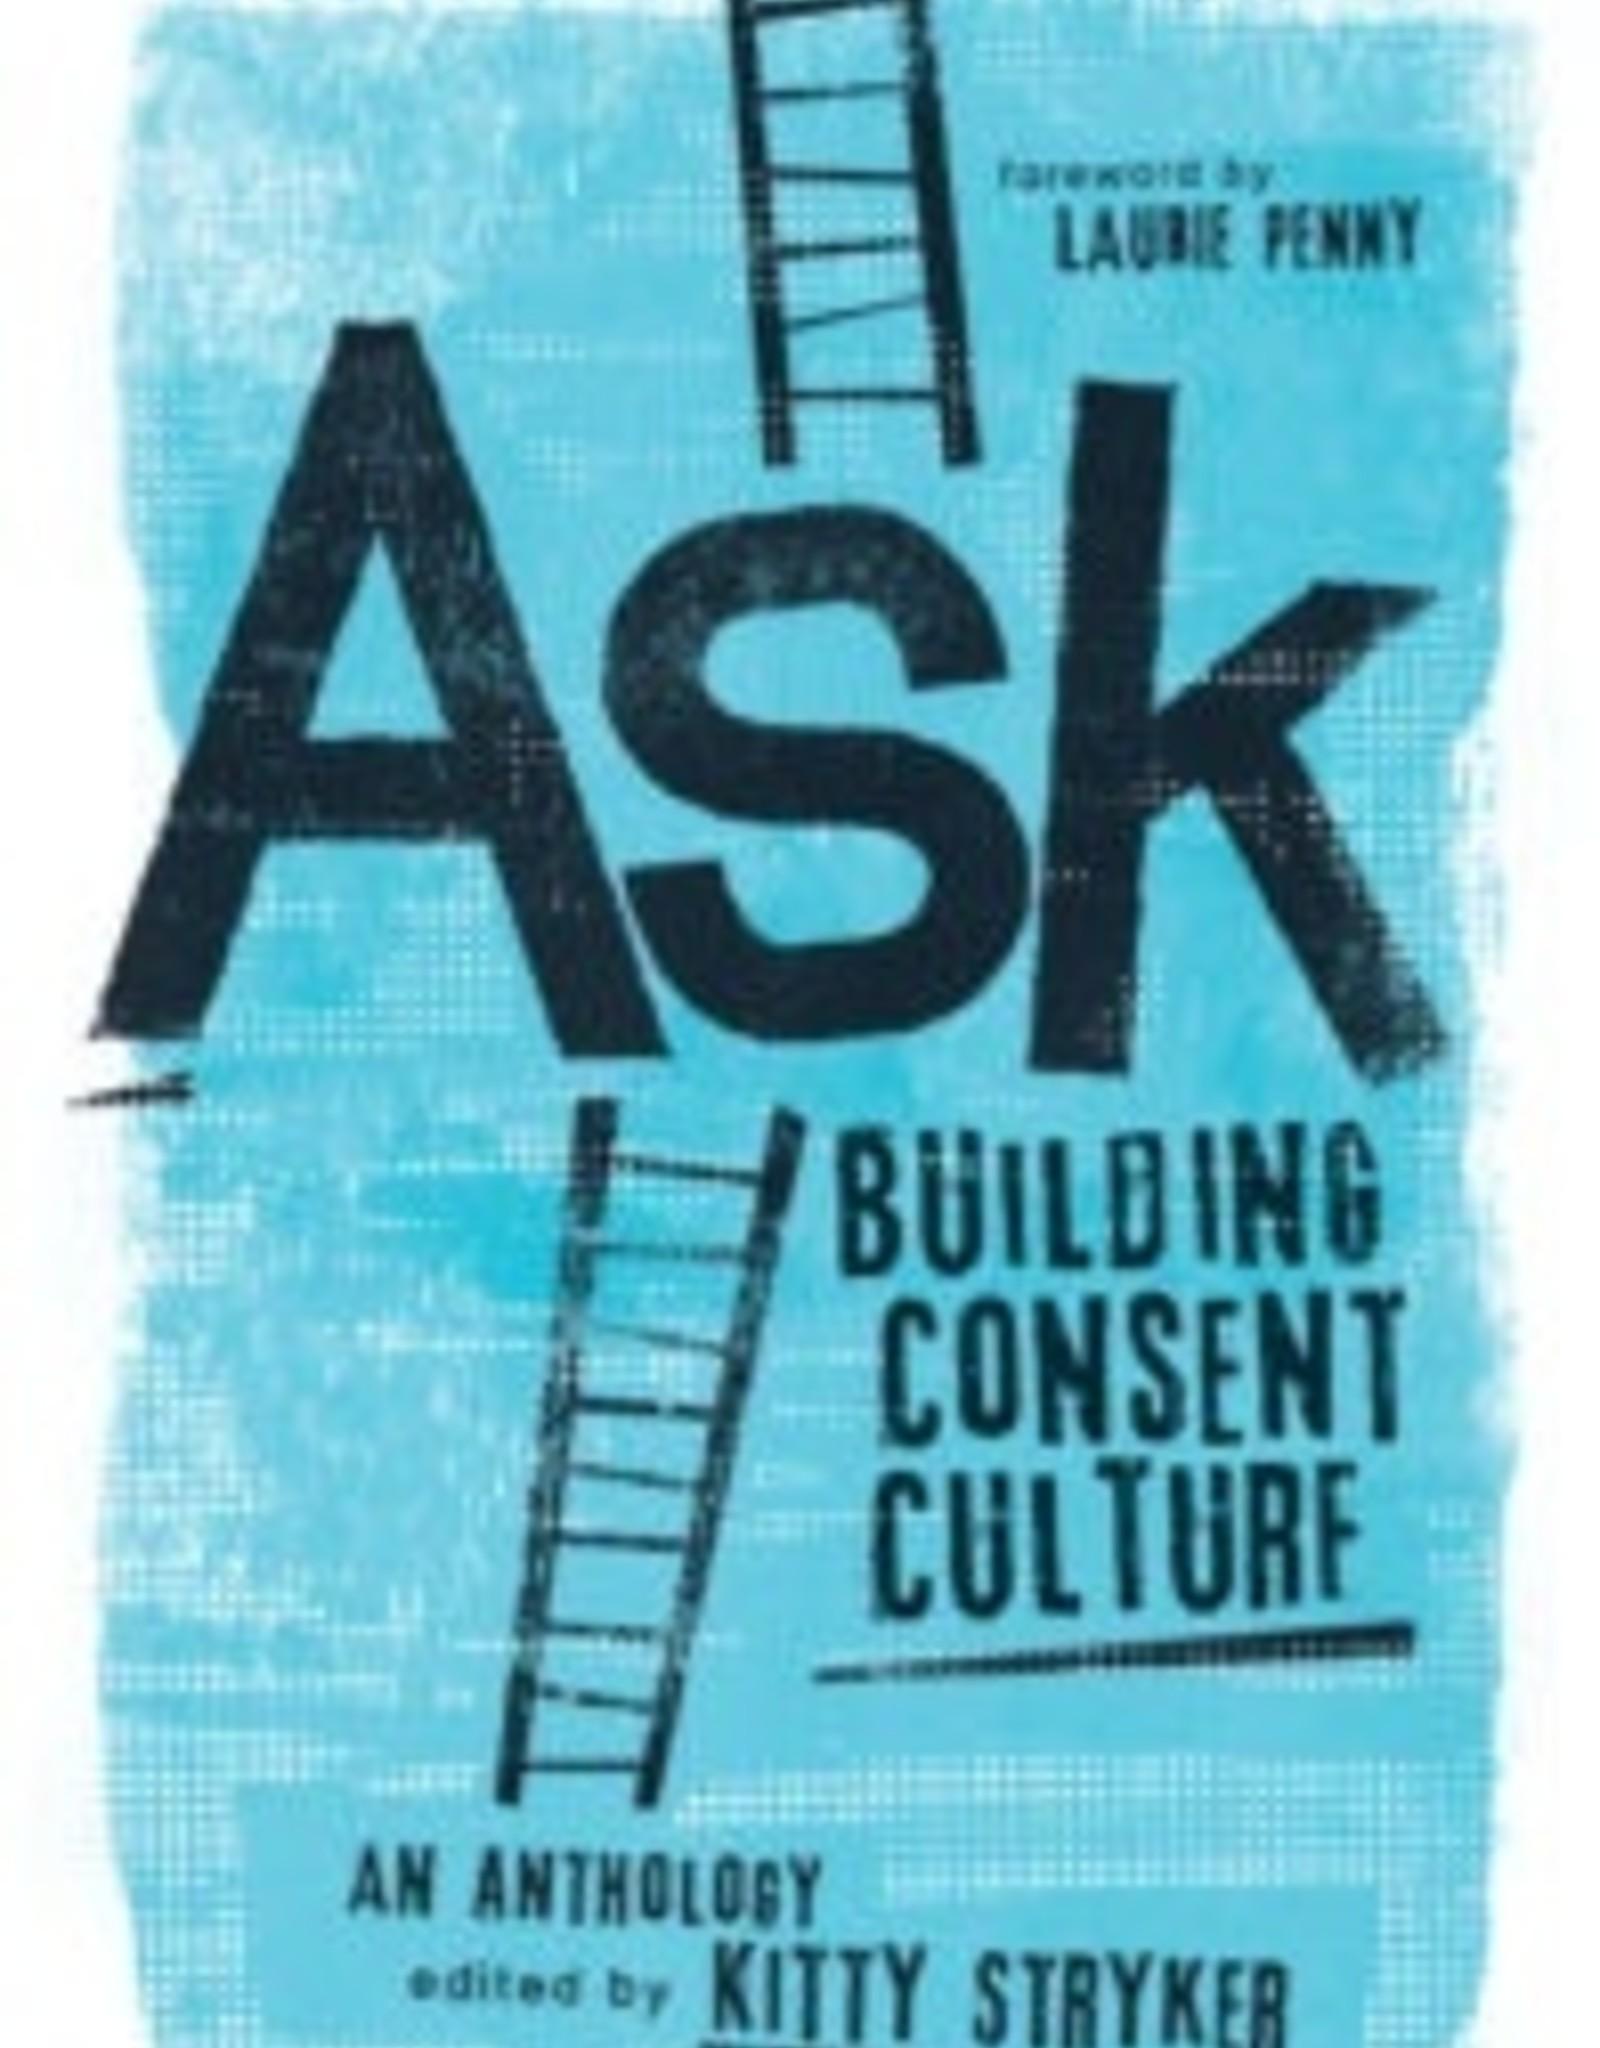 Ingram Ask: Building Consent Culture